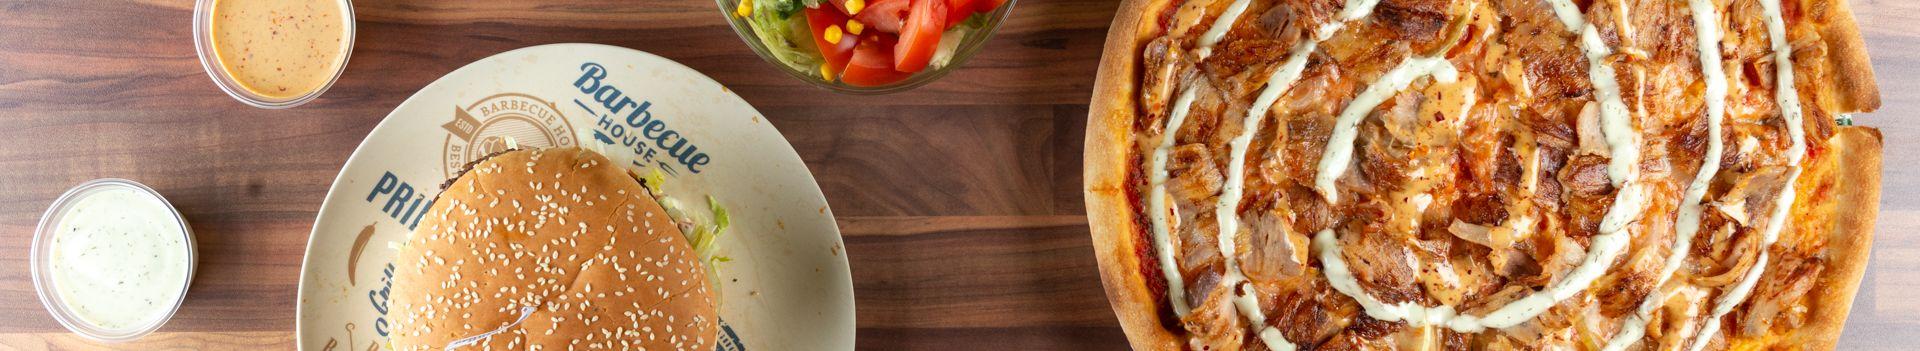 Big Kebap Pizza & Burger Lieferservice in Graz